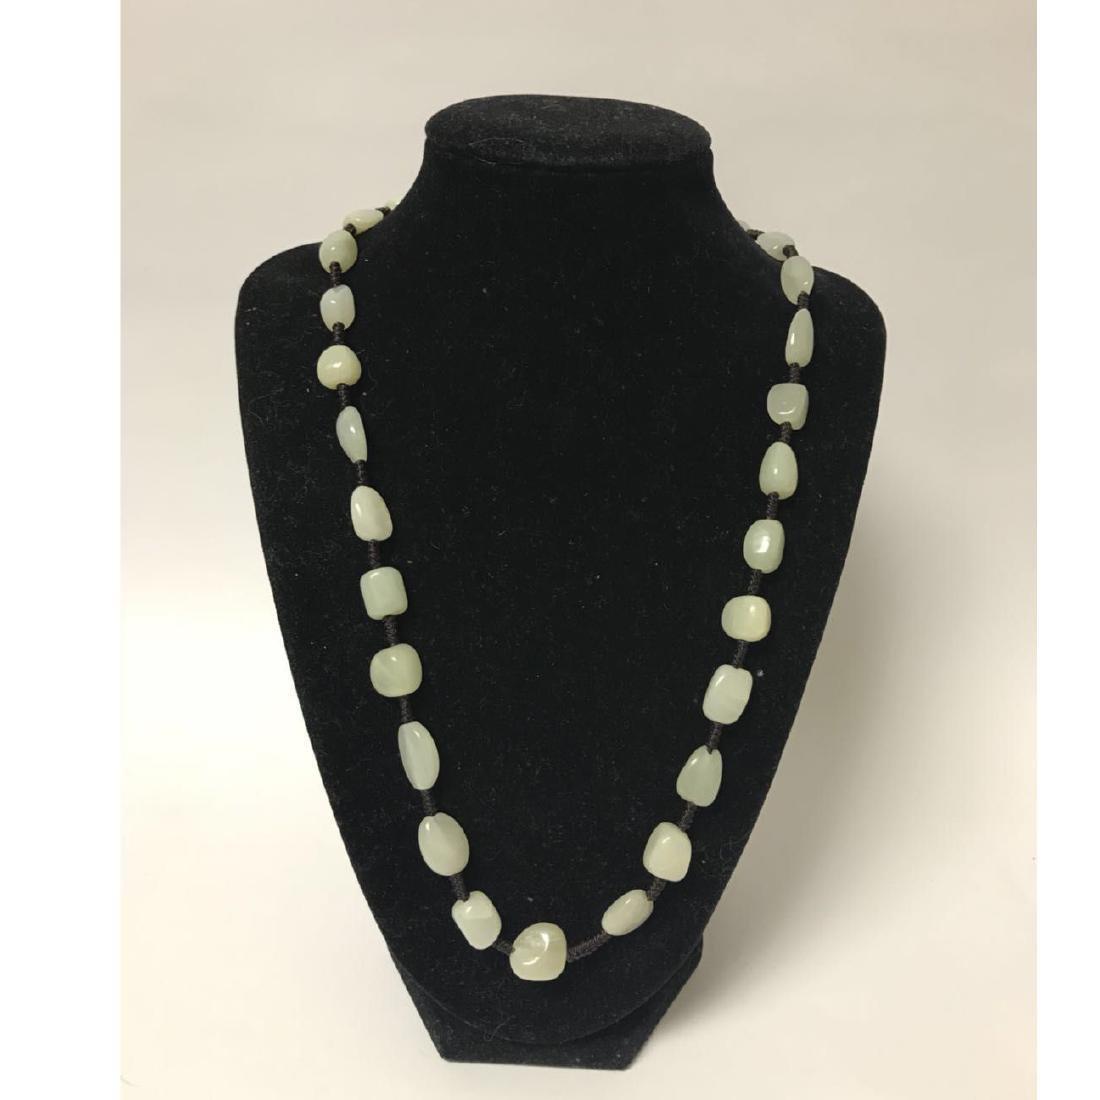 Natural Jade beads necklace